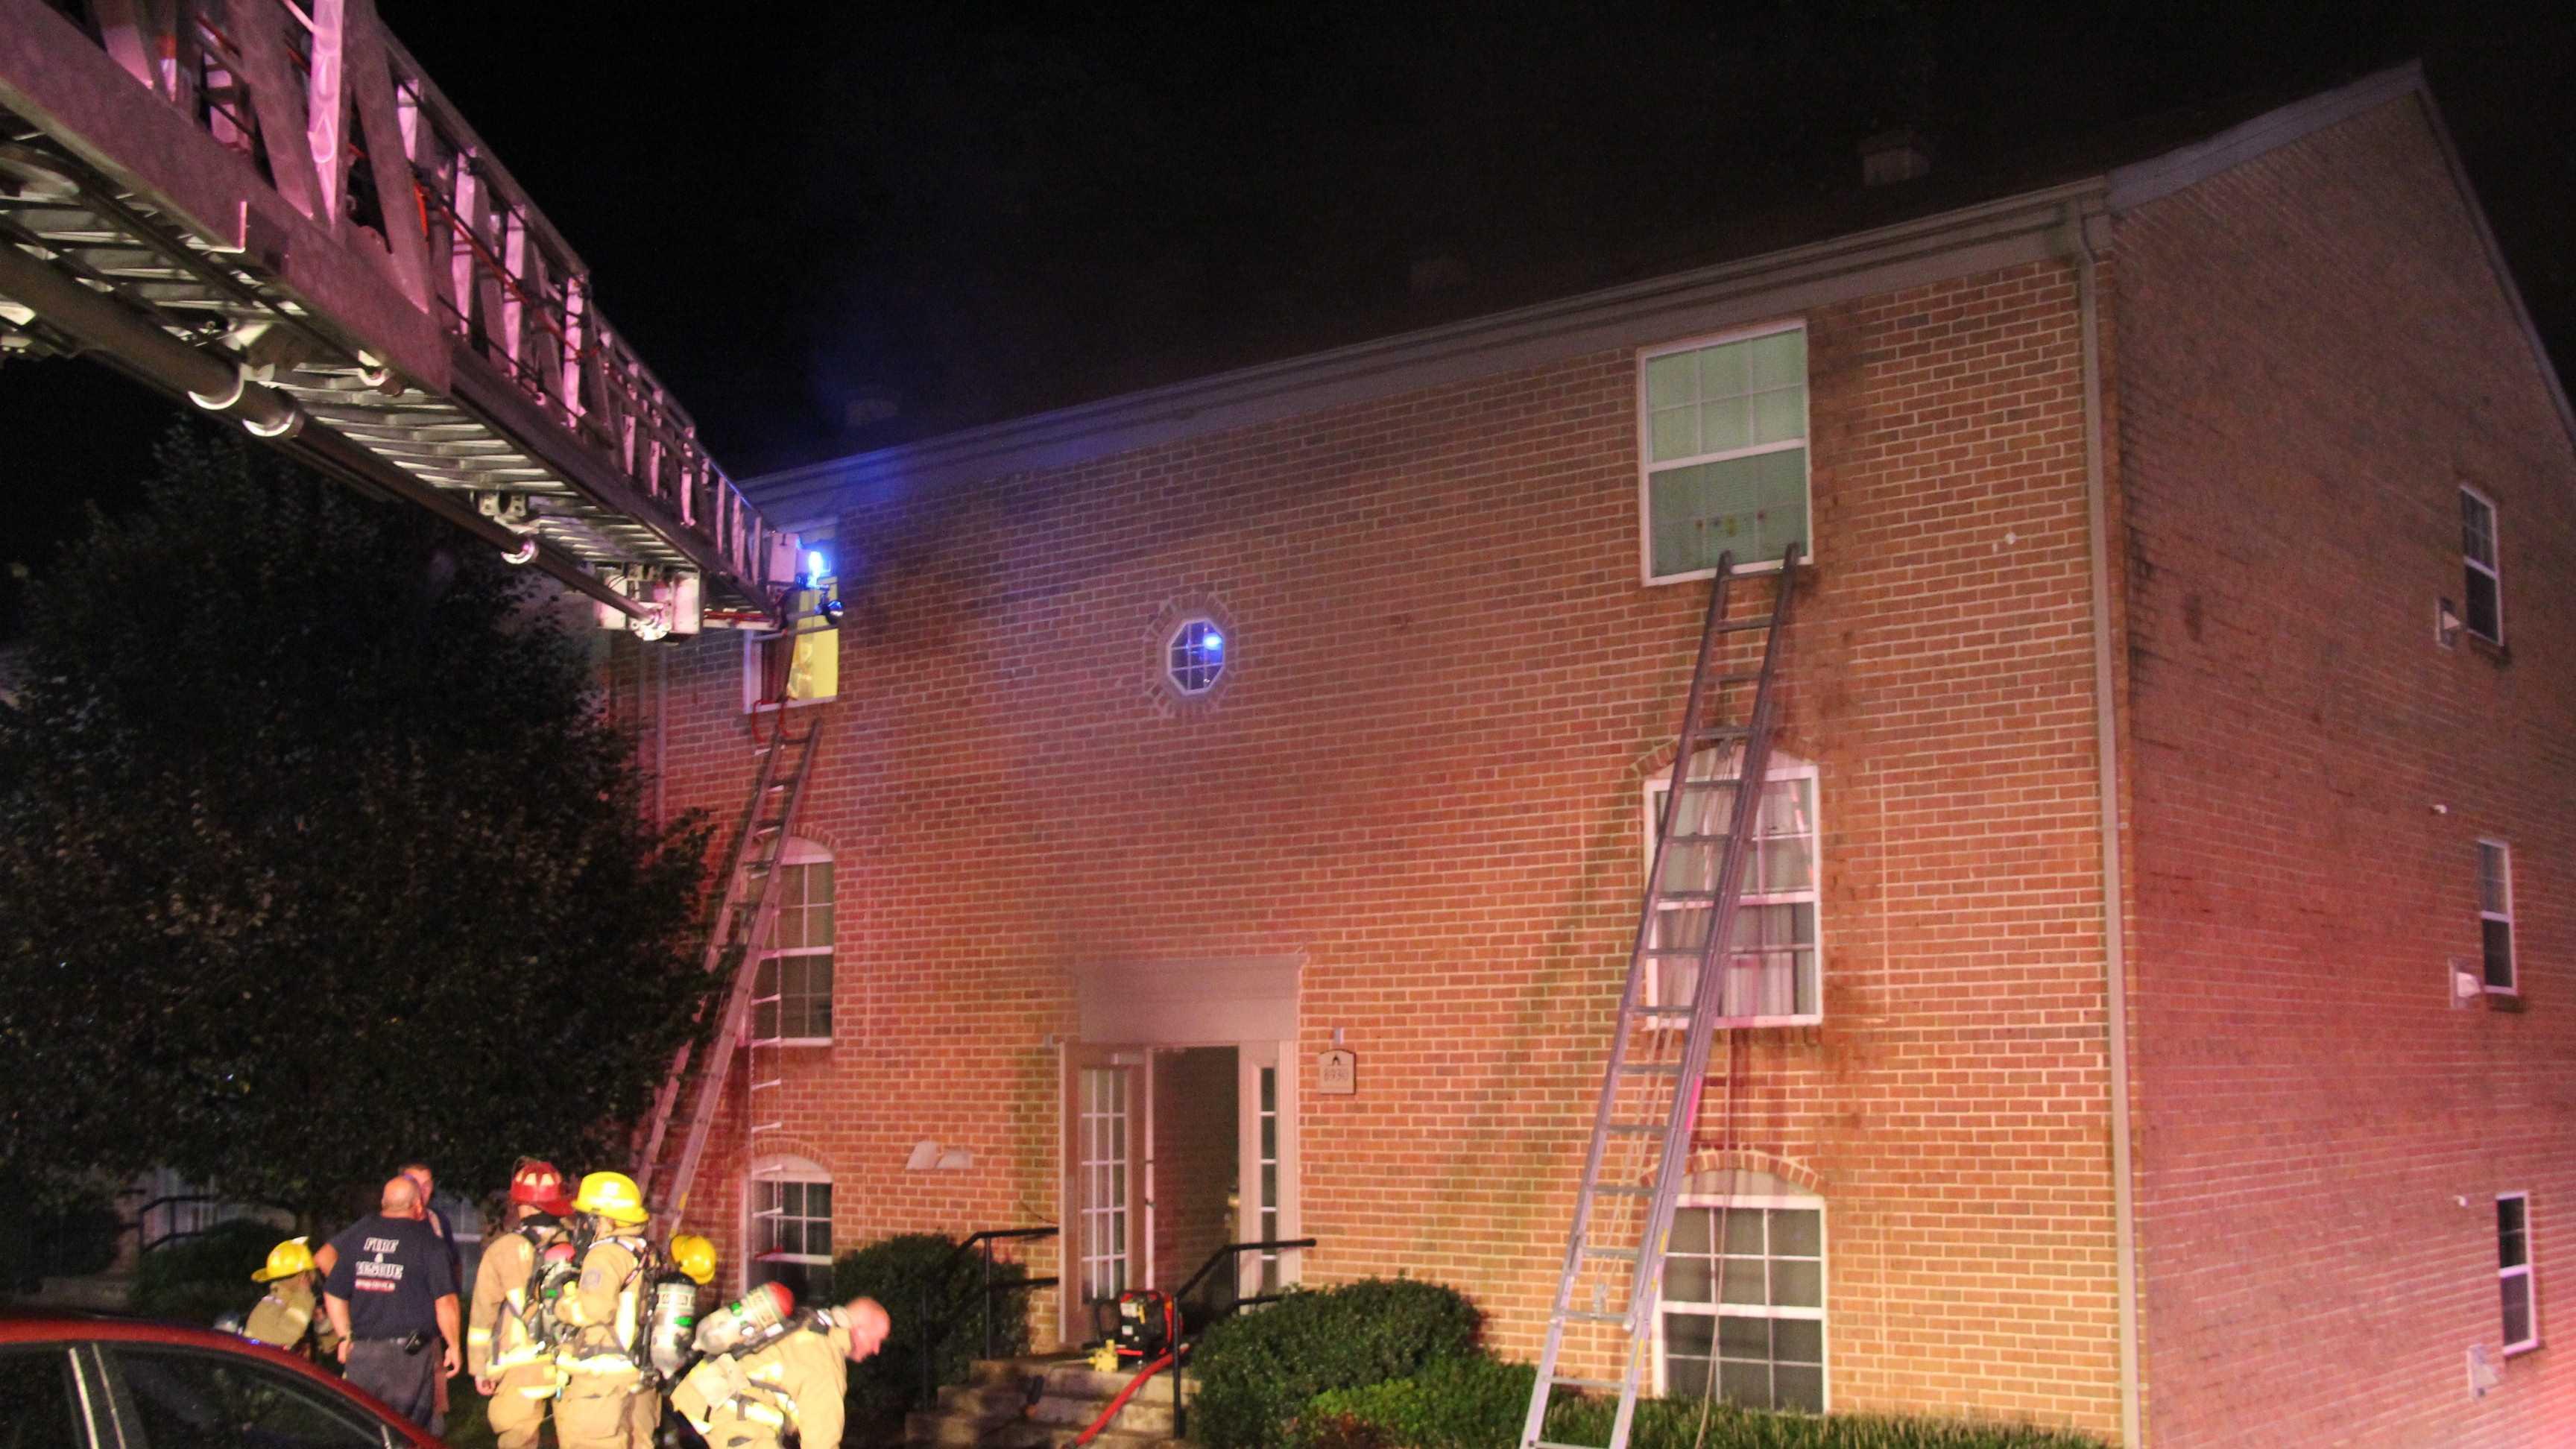 Howard County Fire